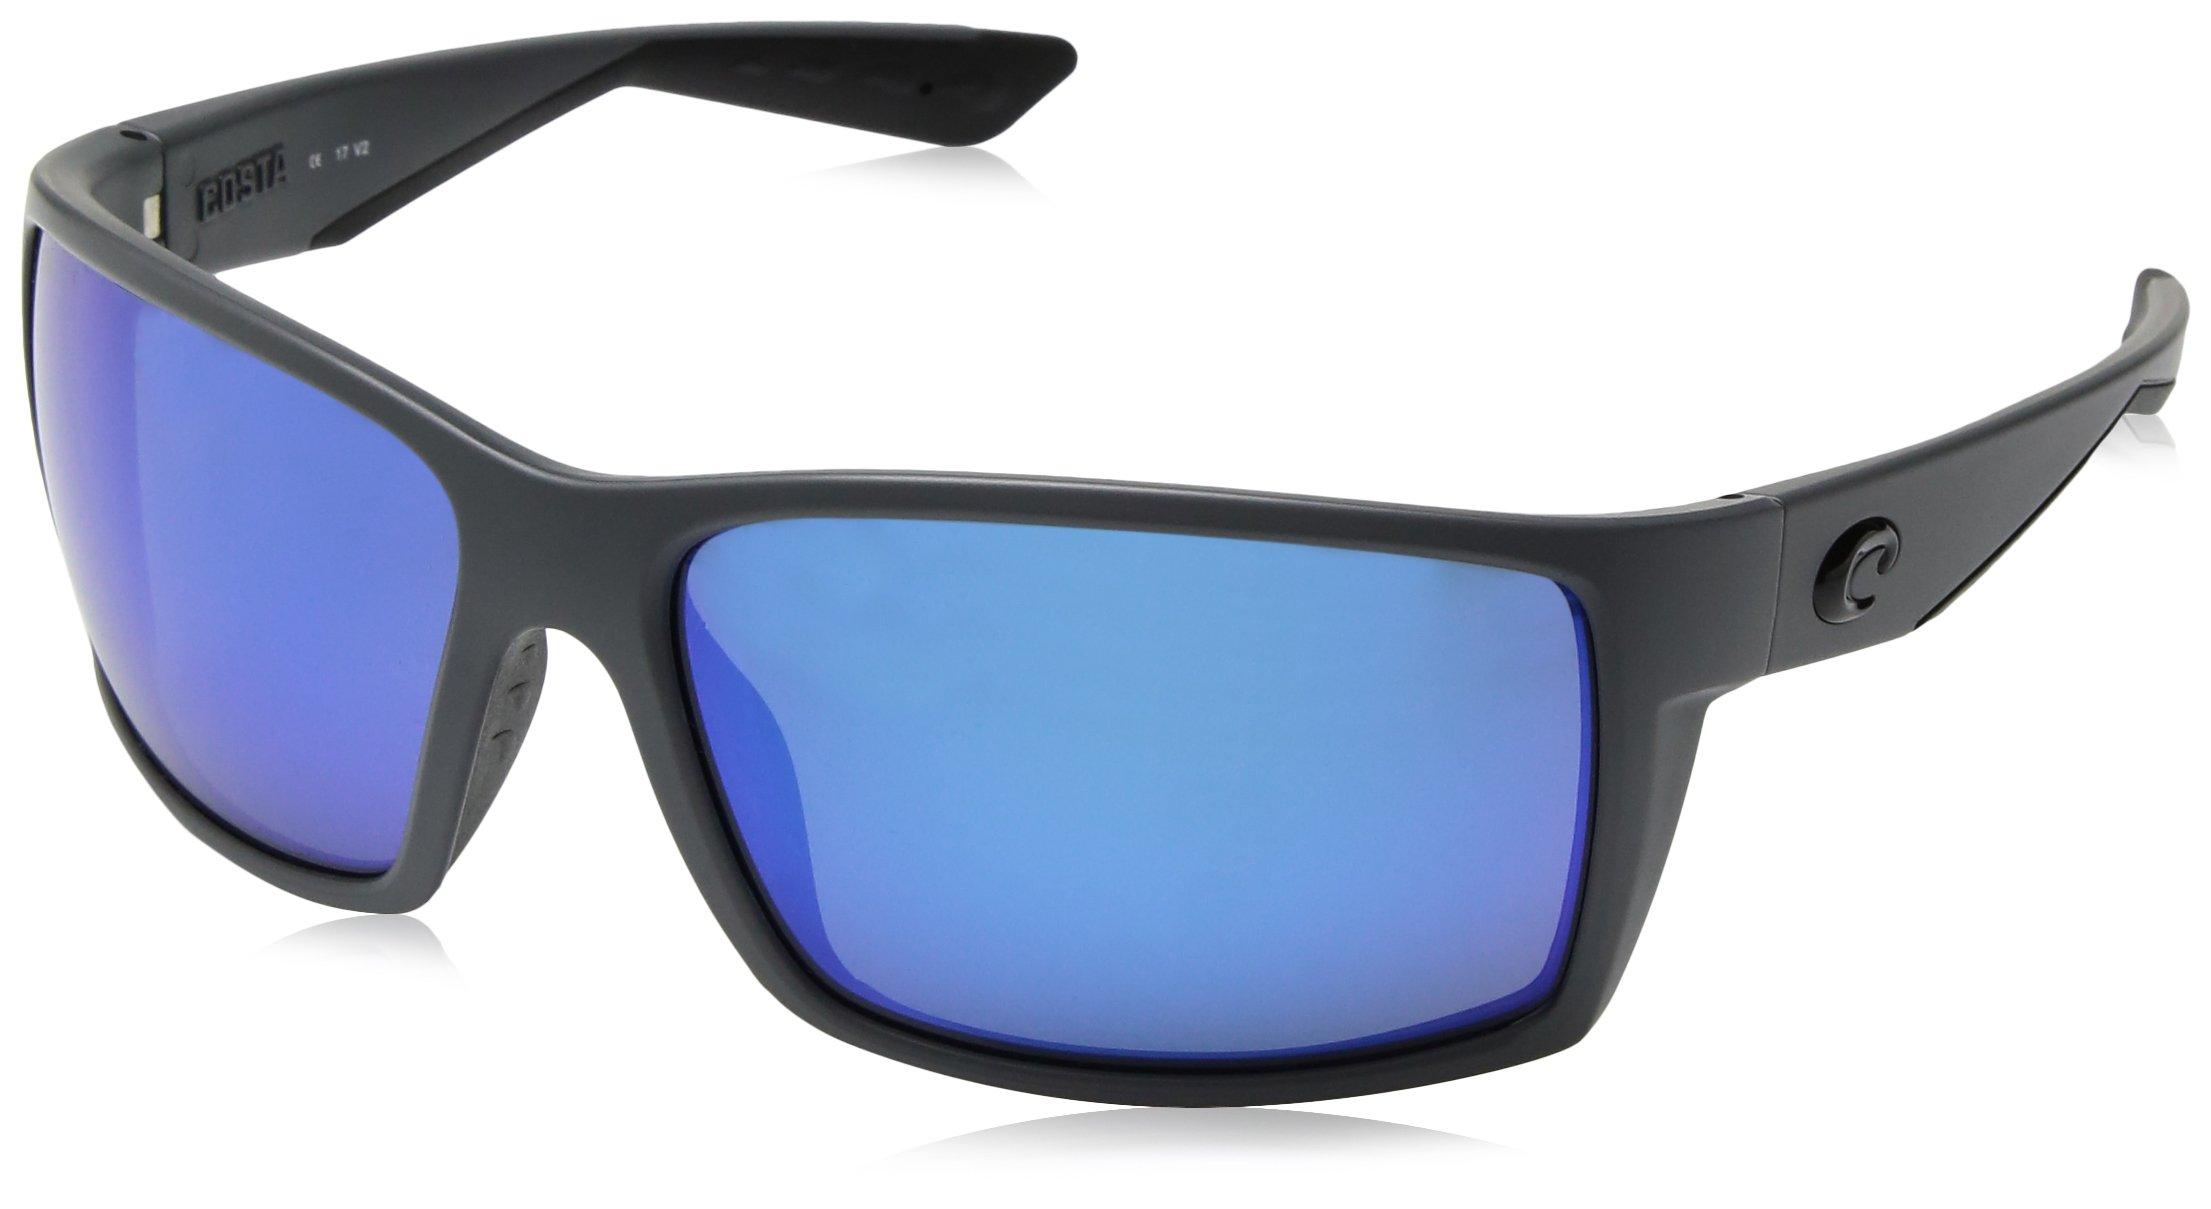 6bb17807f5 Costa del Mar Men s Reefton Polarized Iridium Rectangular Sunglasses ...